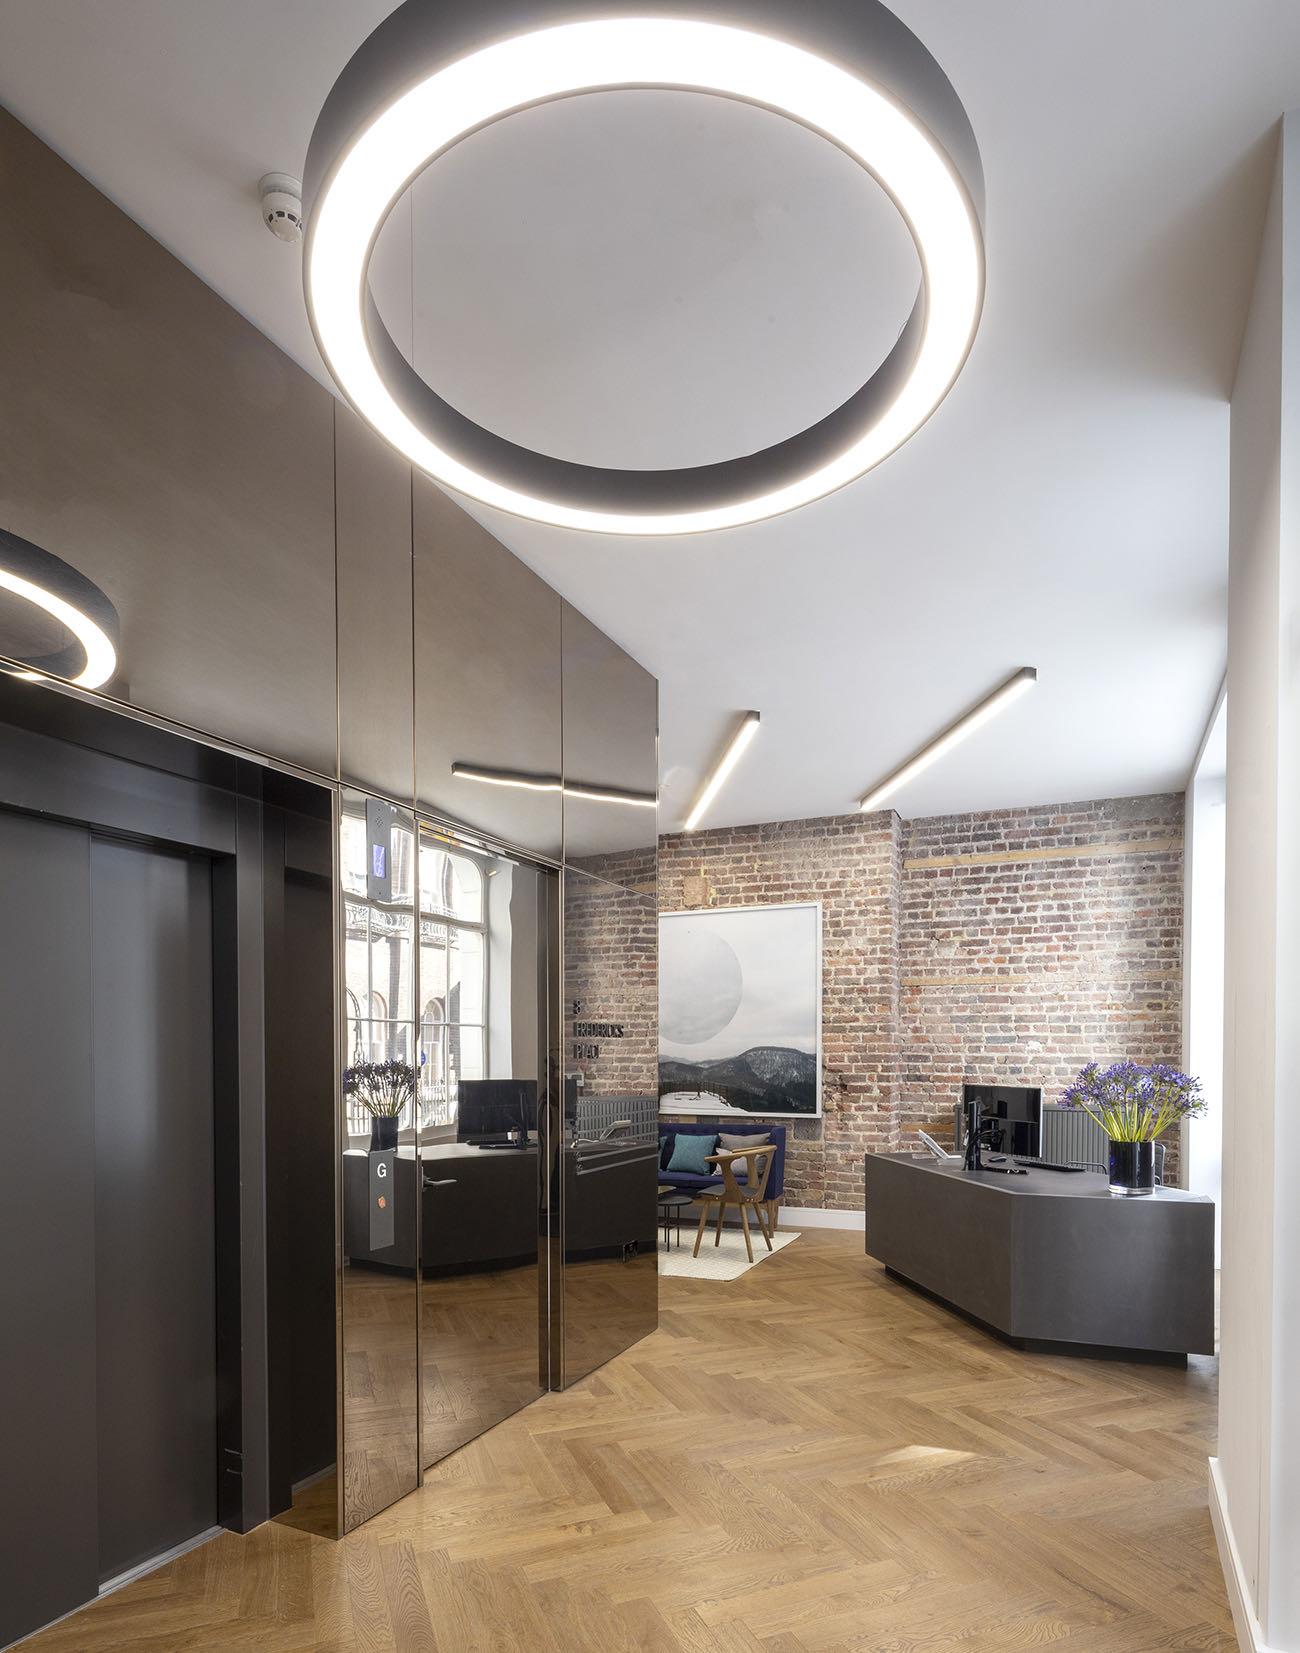 fredericks-place-london-office-1